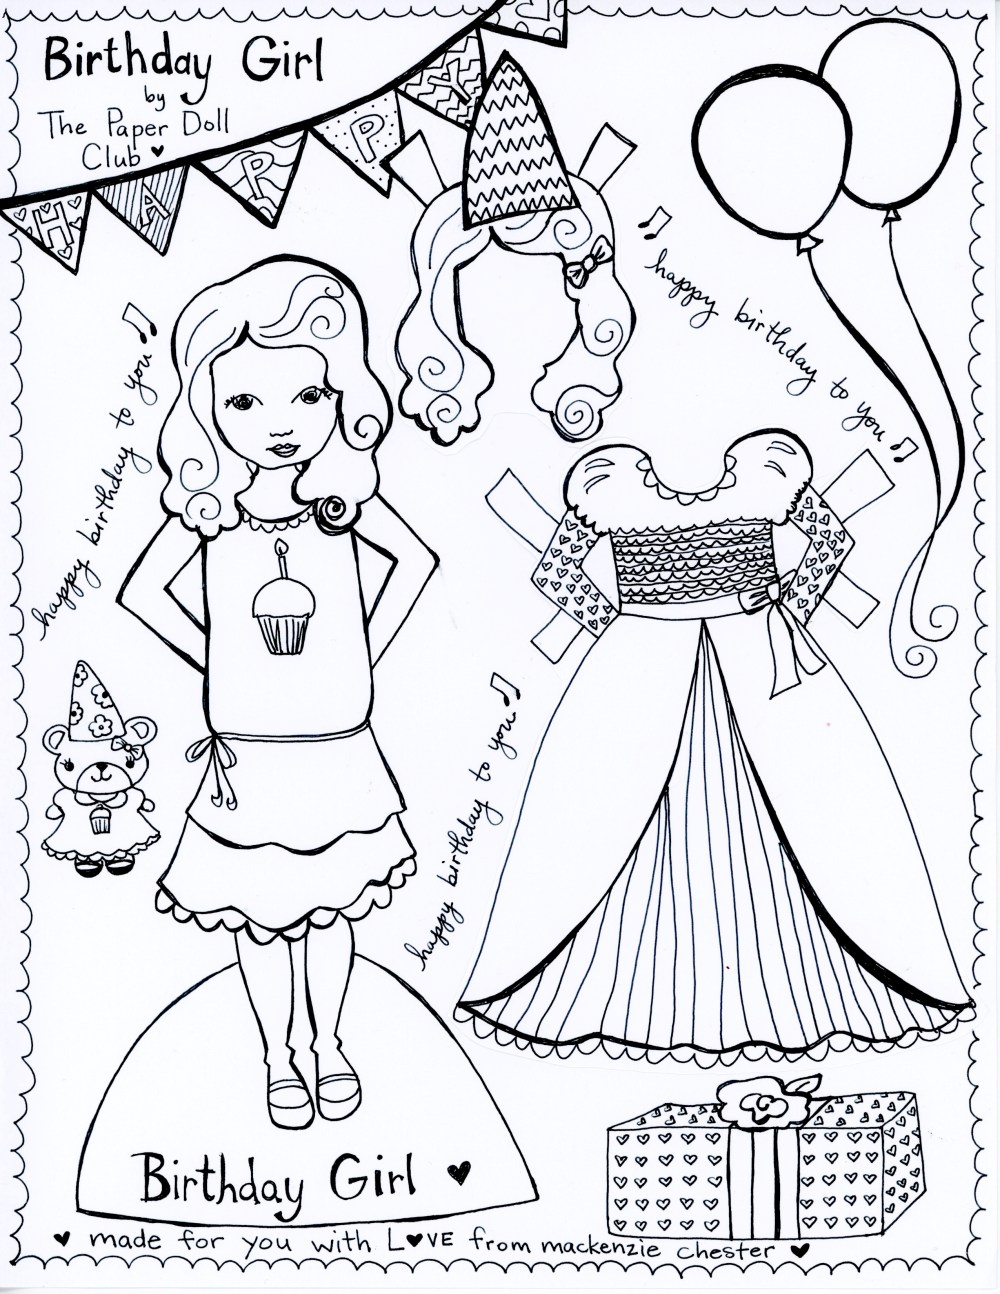 Birthday Girl Free Printable Paper Doll